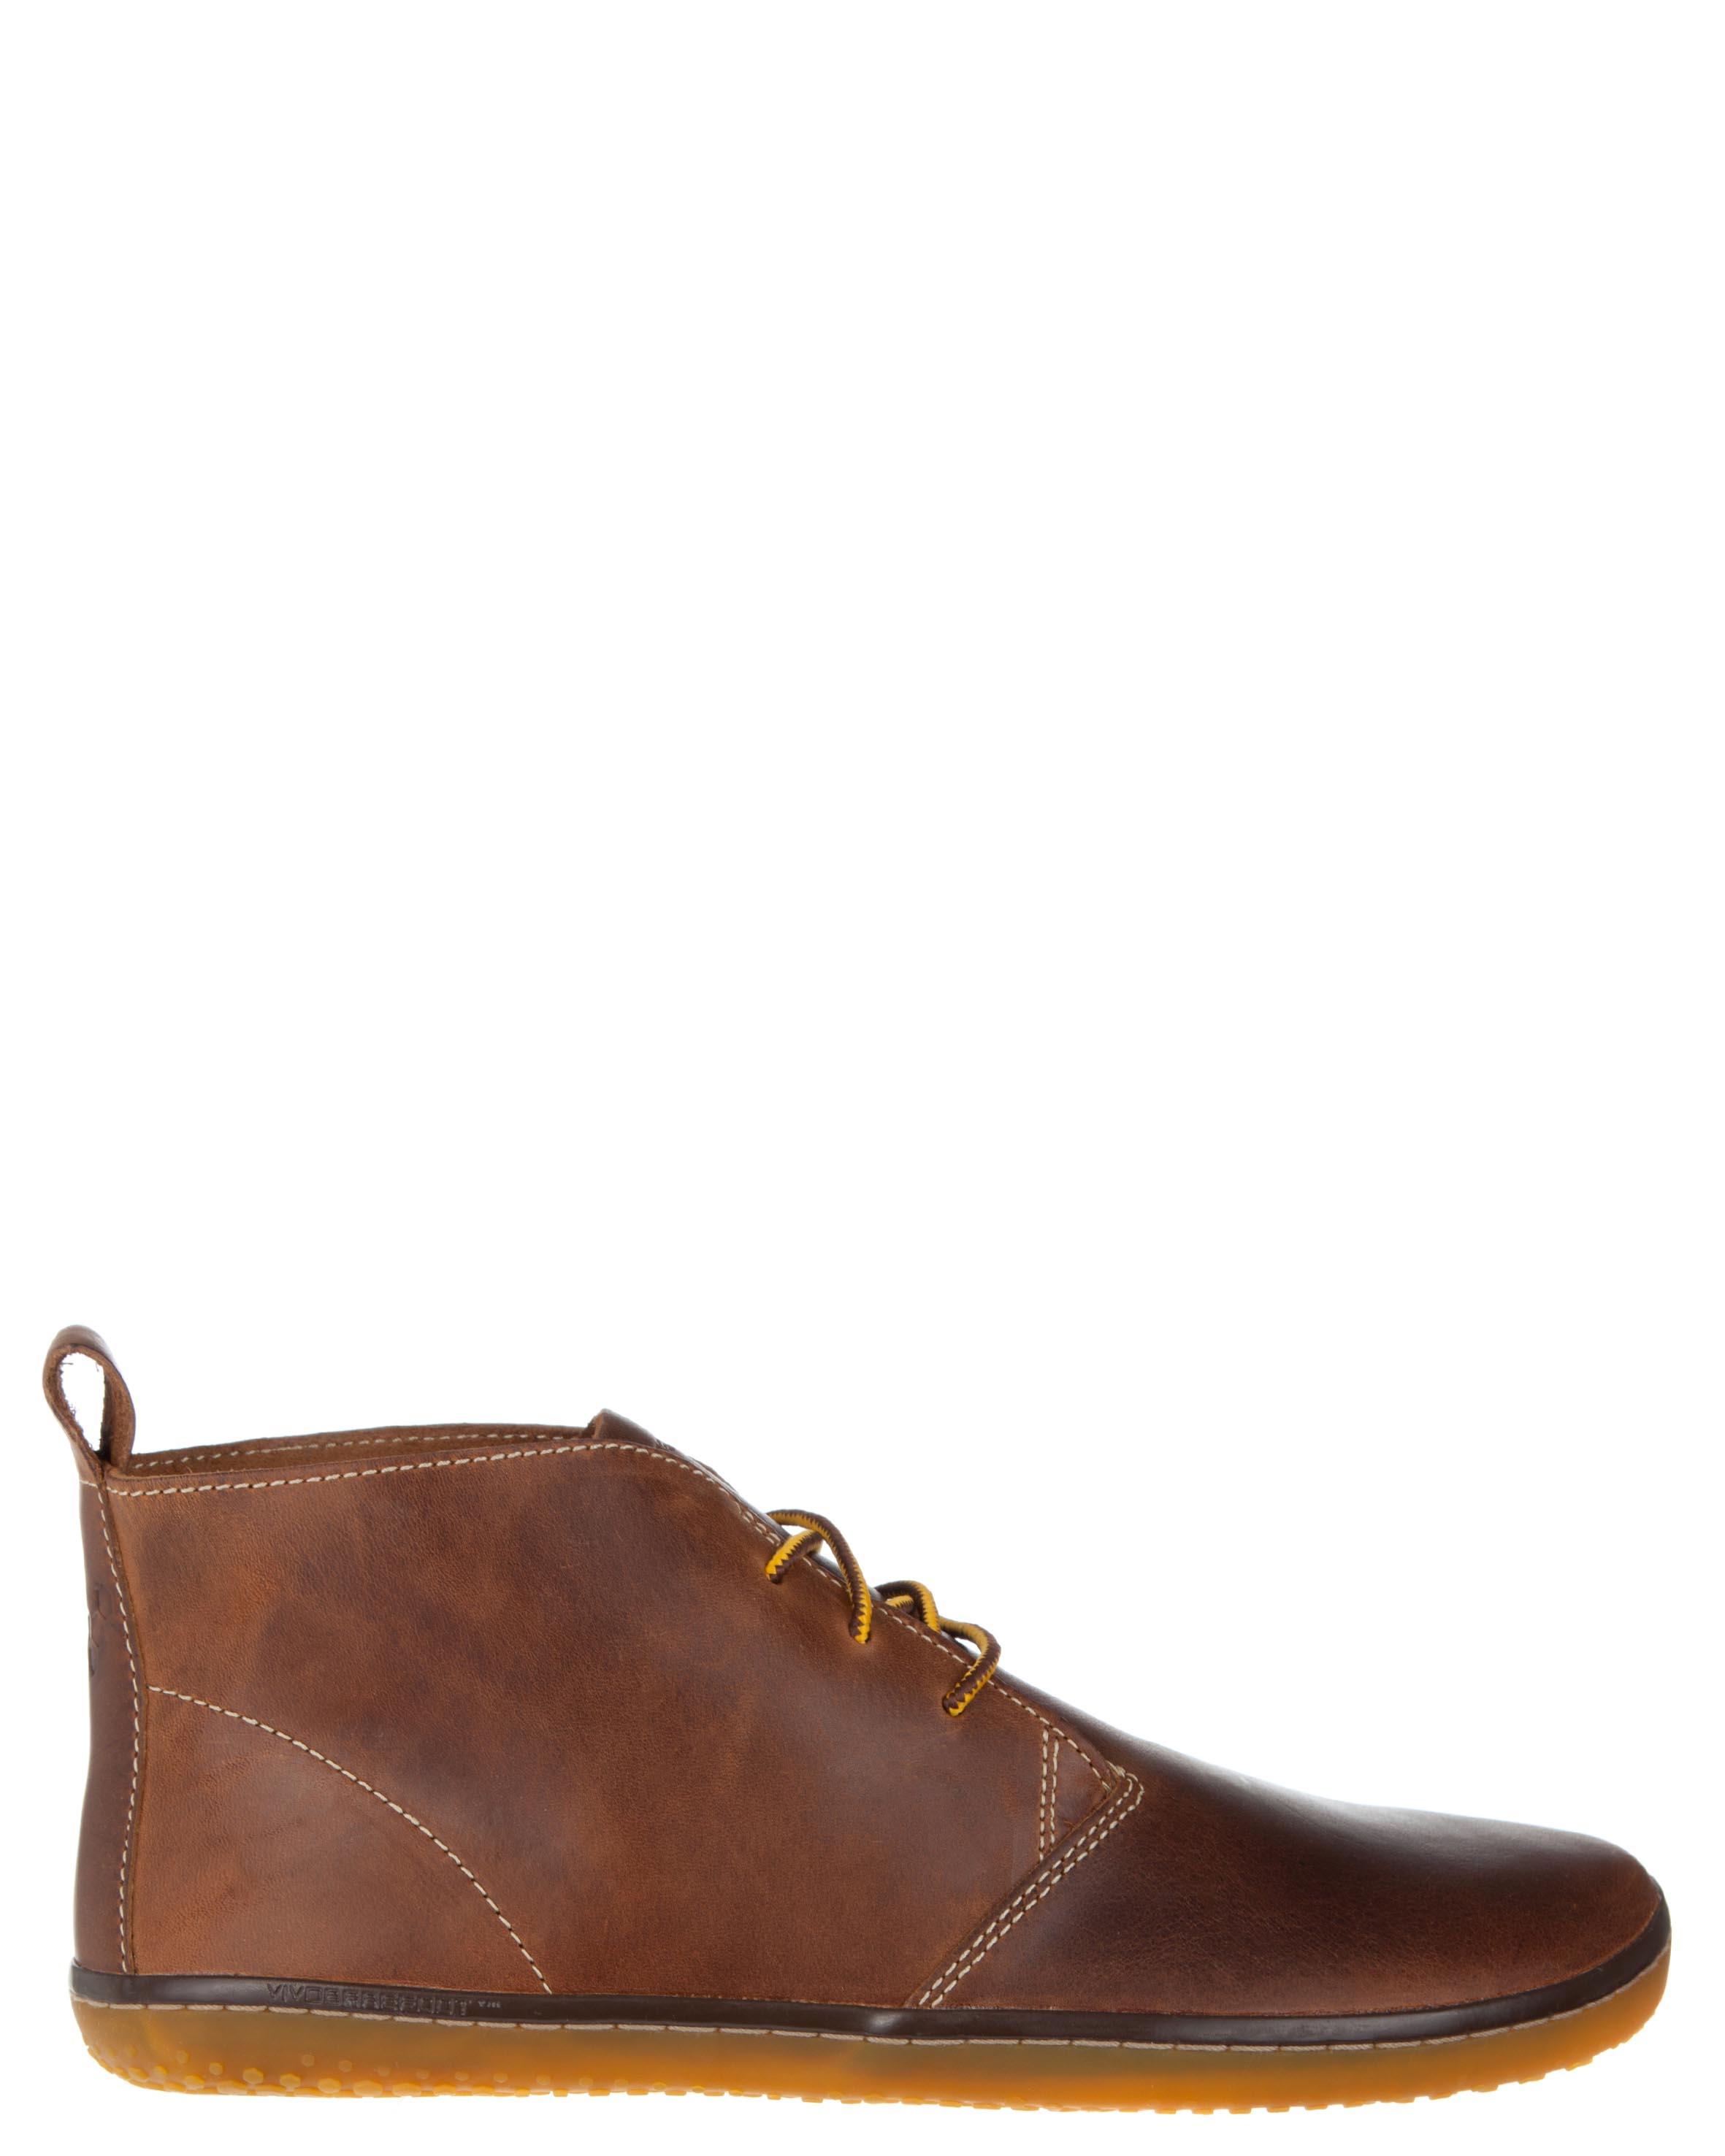 Women shoes online. Best place to buy combat boots